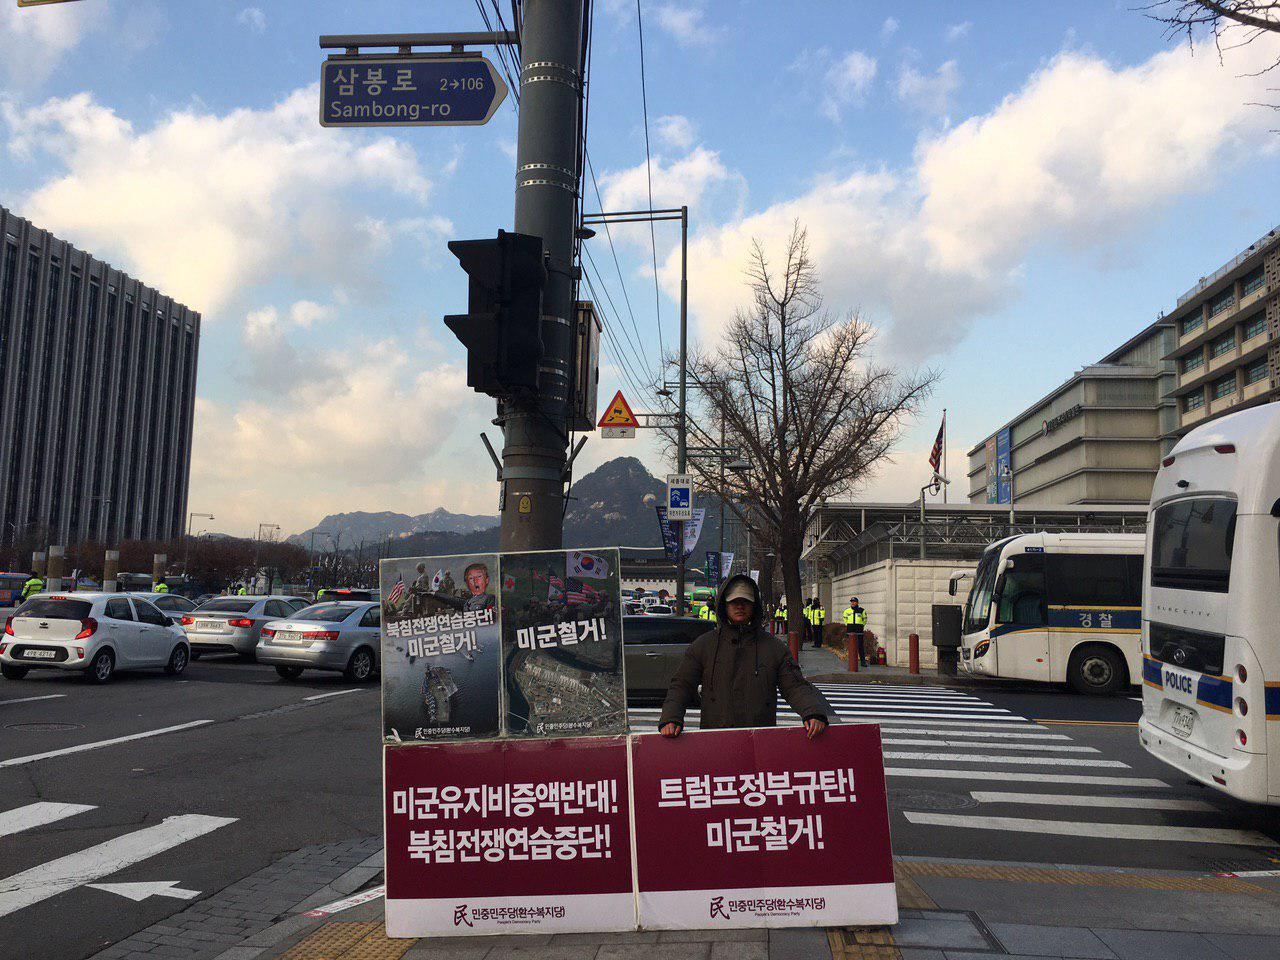 photo_2019-12-04_21-38-51.jpg